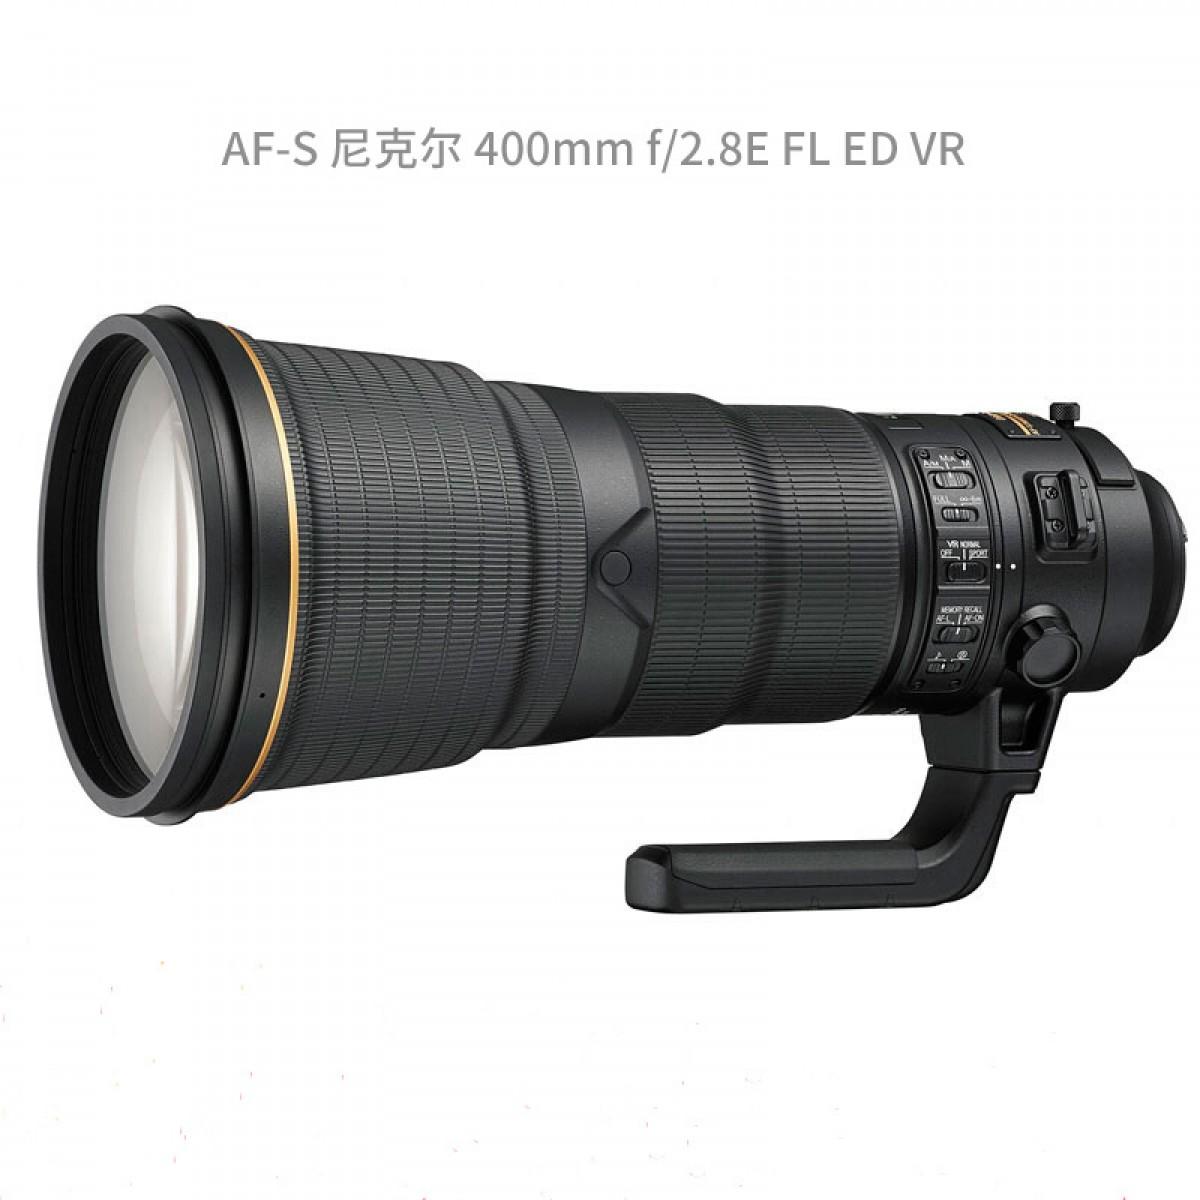 尼康(nikon) 全幅远摄/超远摄定焦镜头 AF-S VR 400mm/2.8E